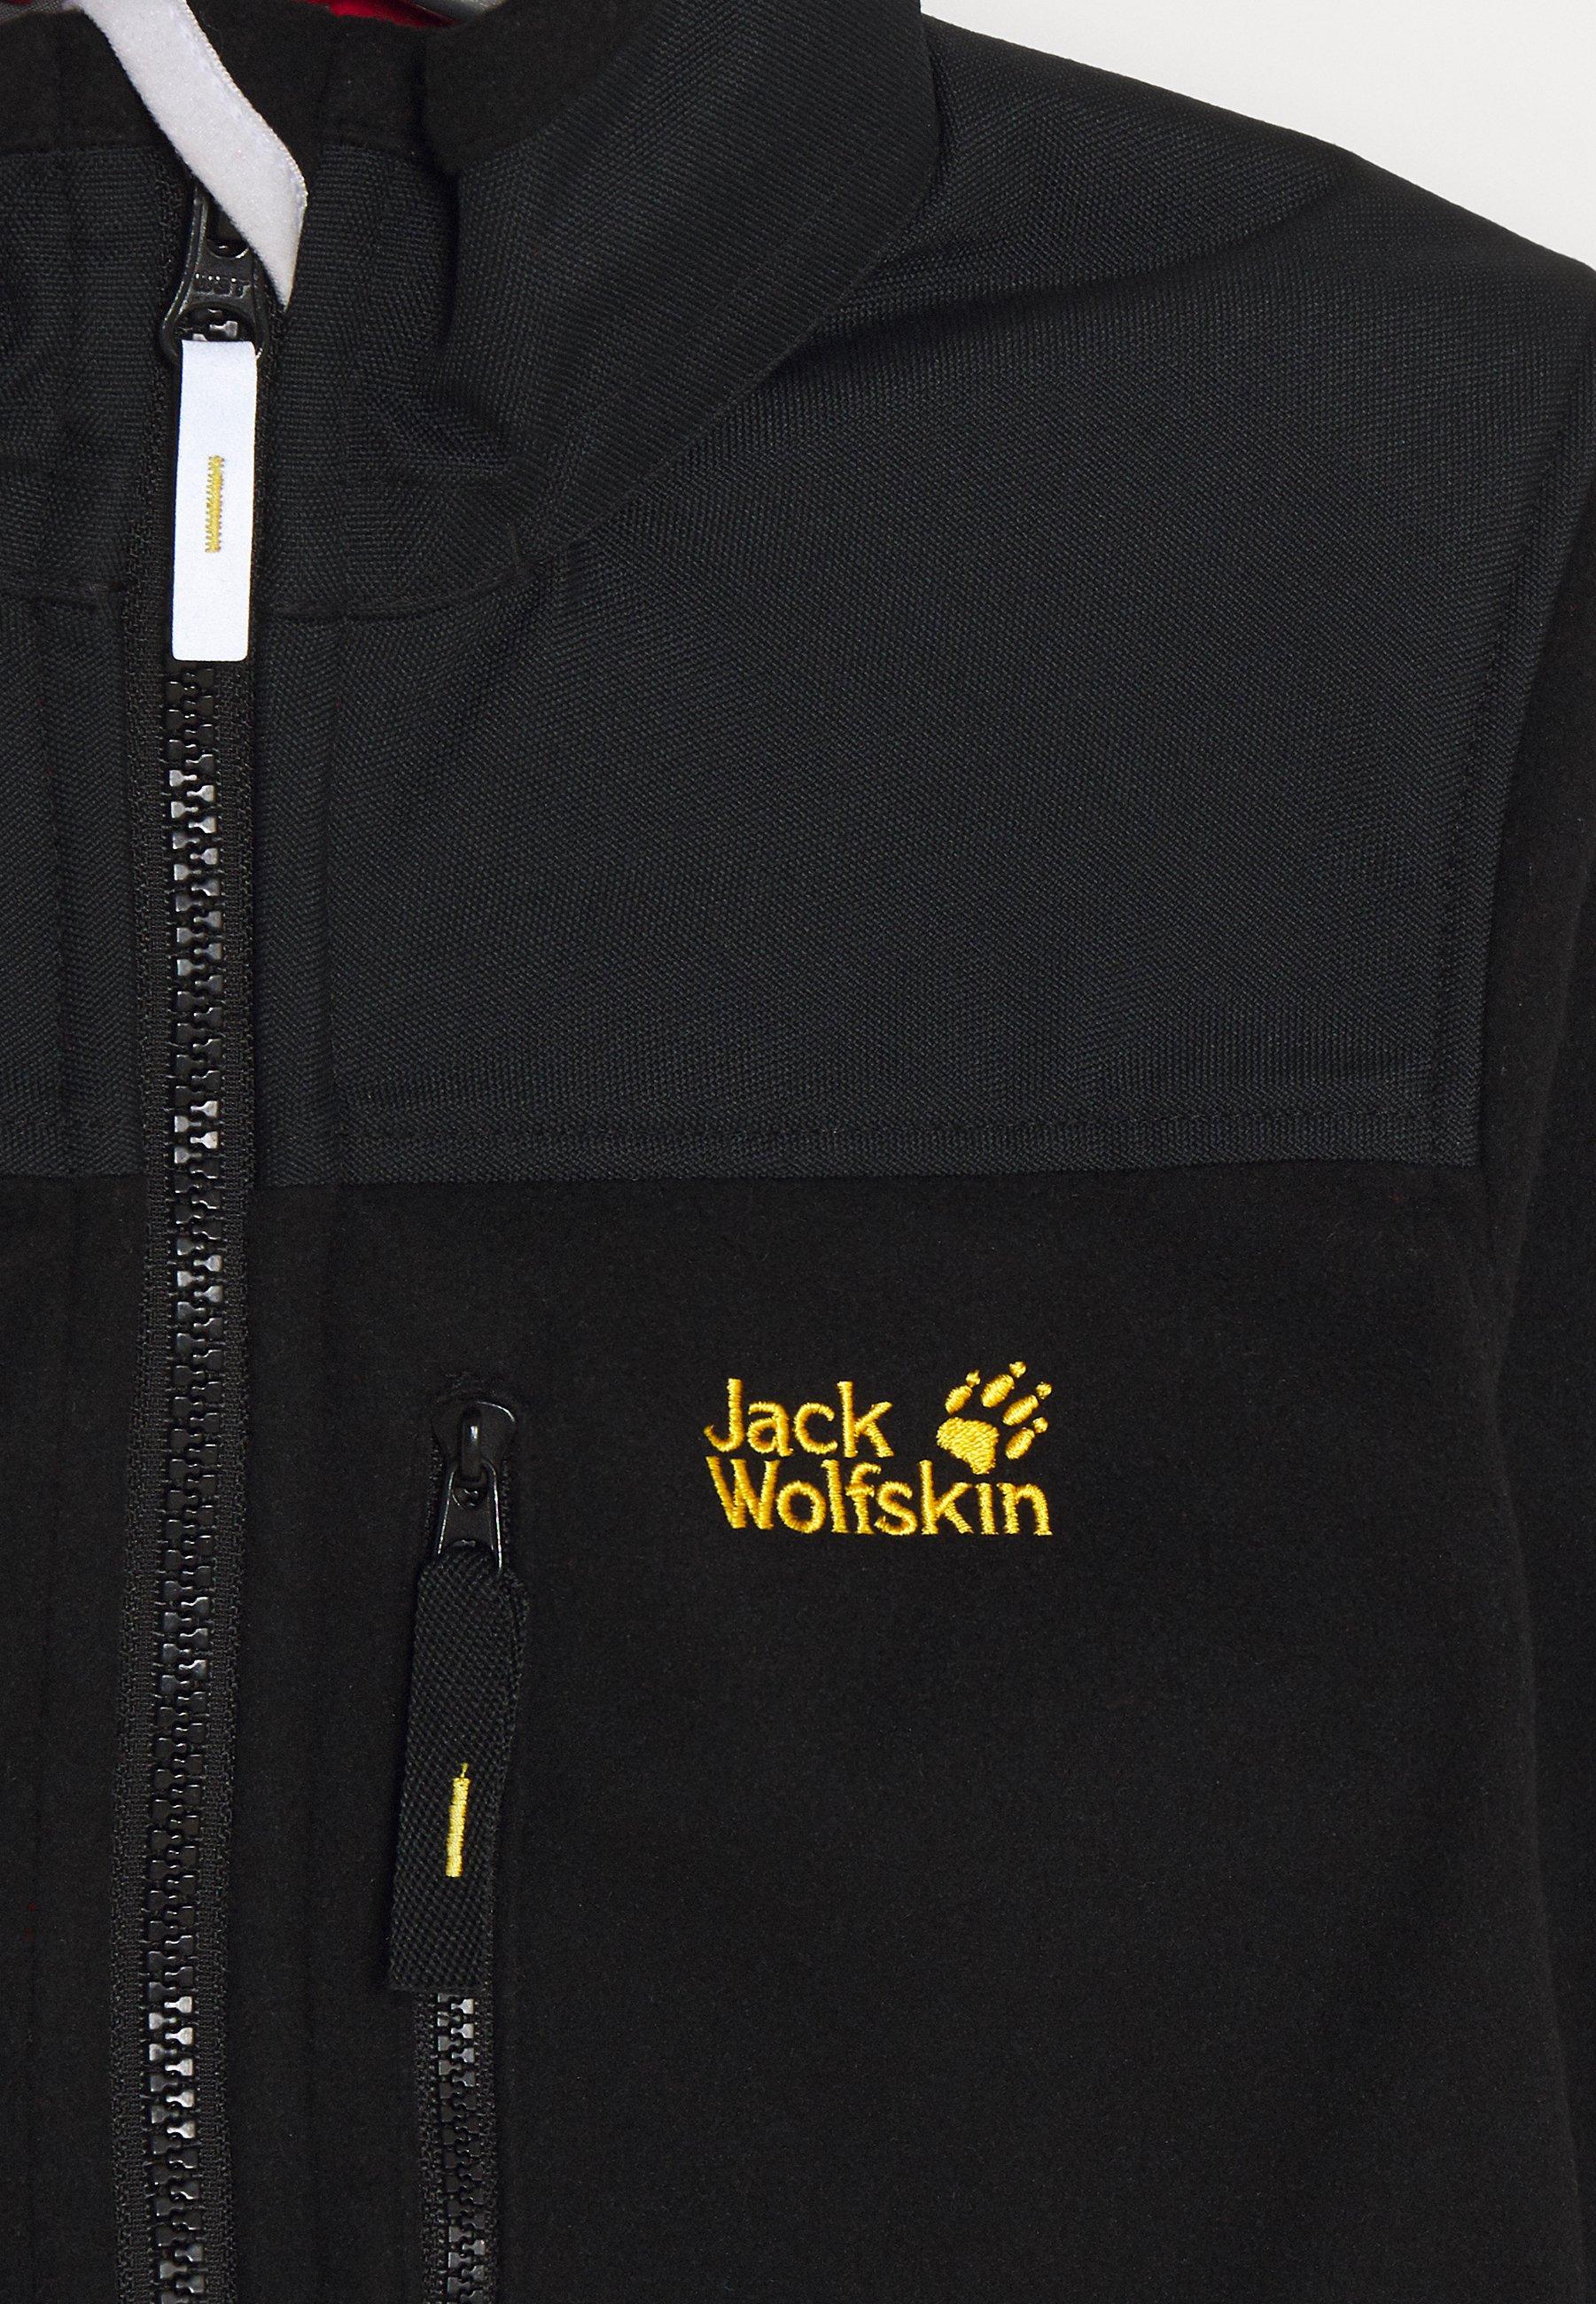 jack wolfskin kinde tropical forest fleece jacke